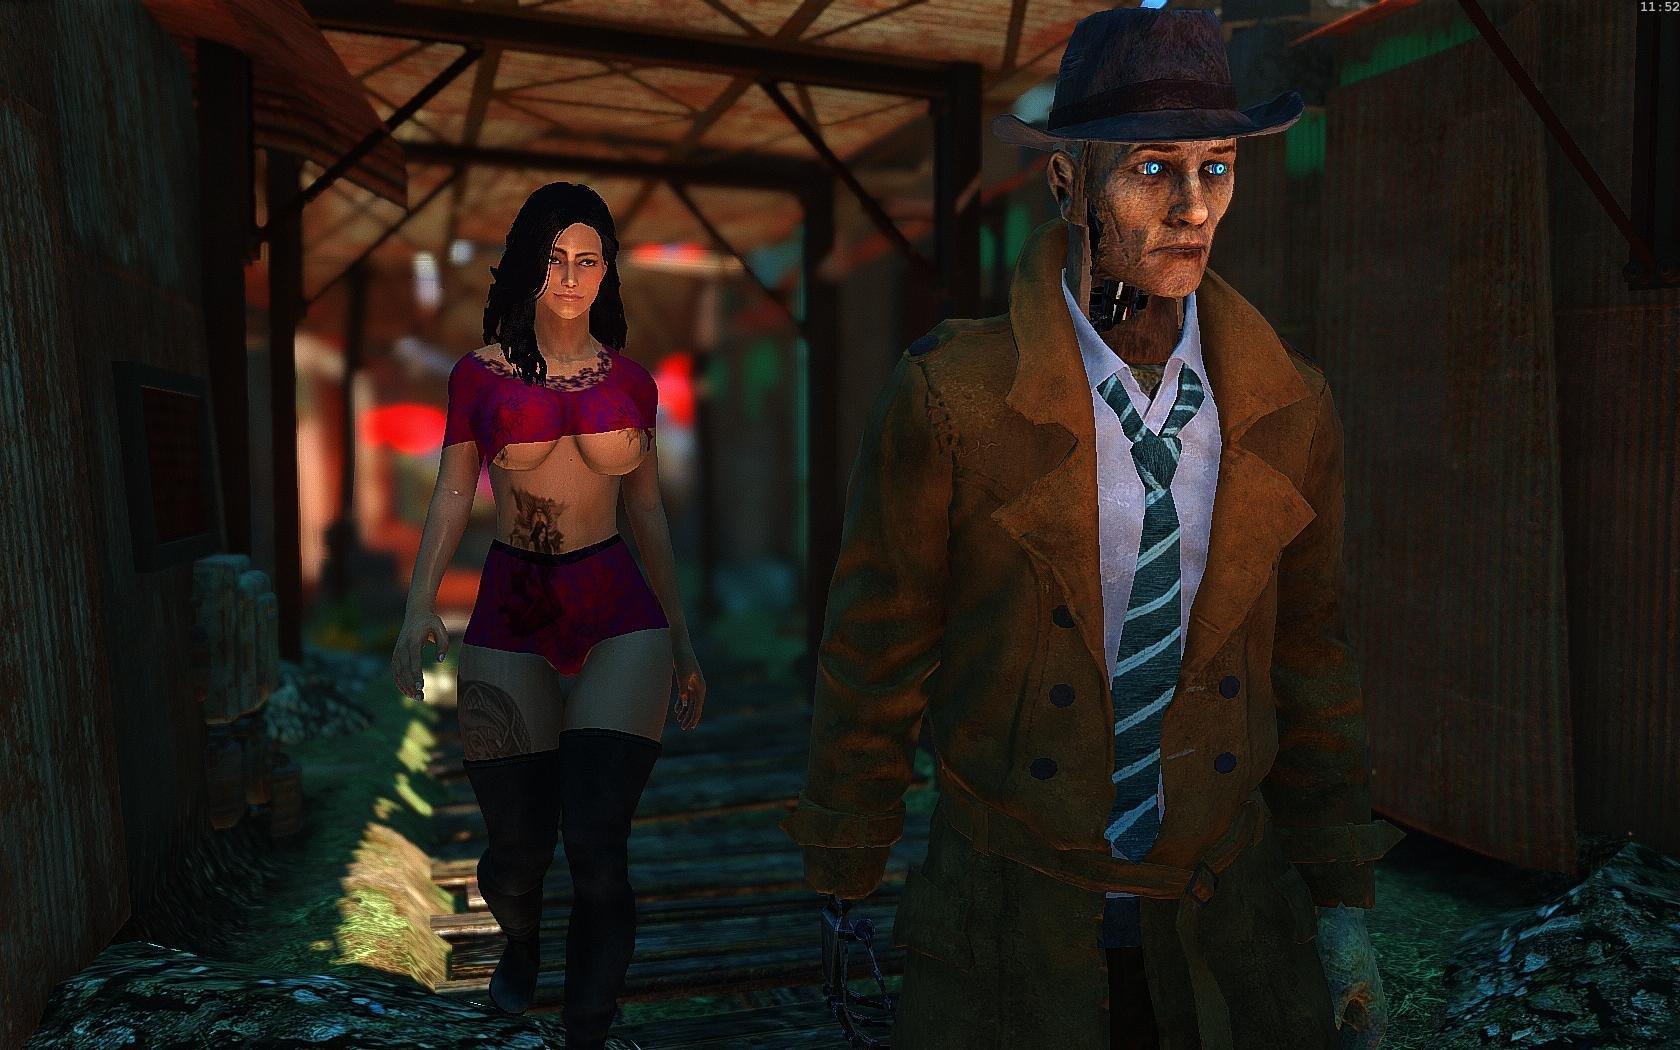 Fallout4 2019-02-14 11-52-22-41